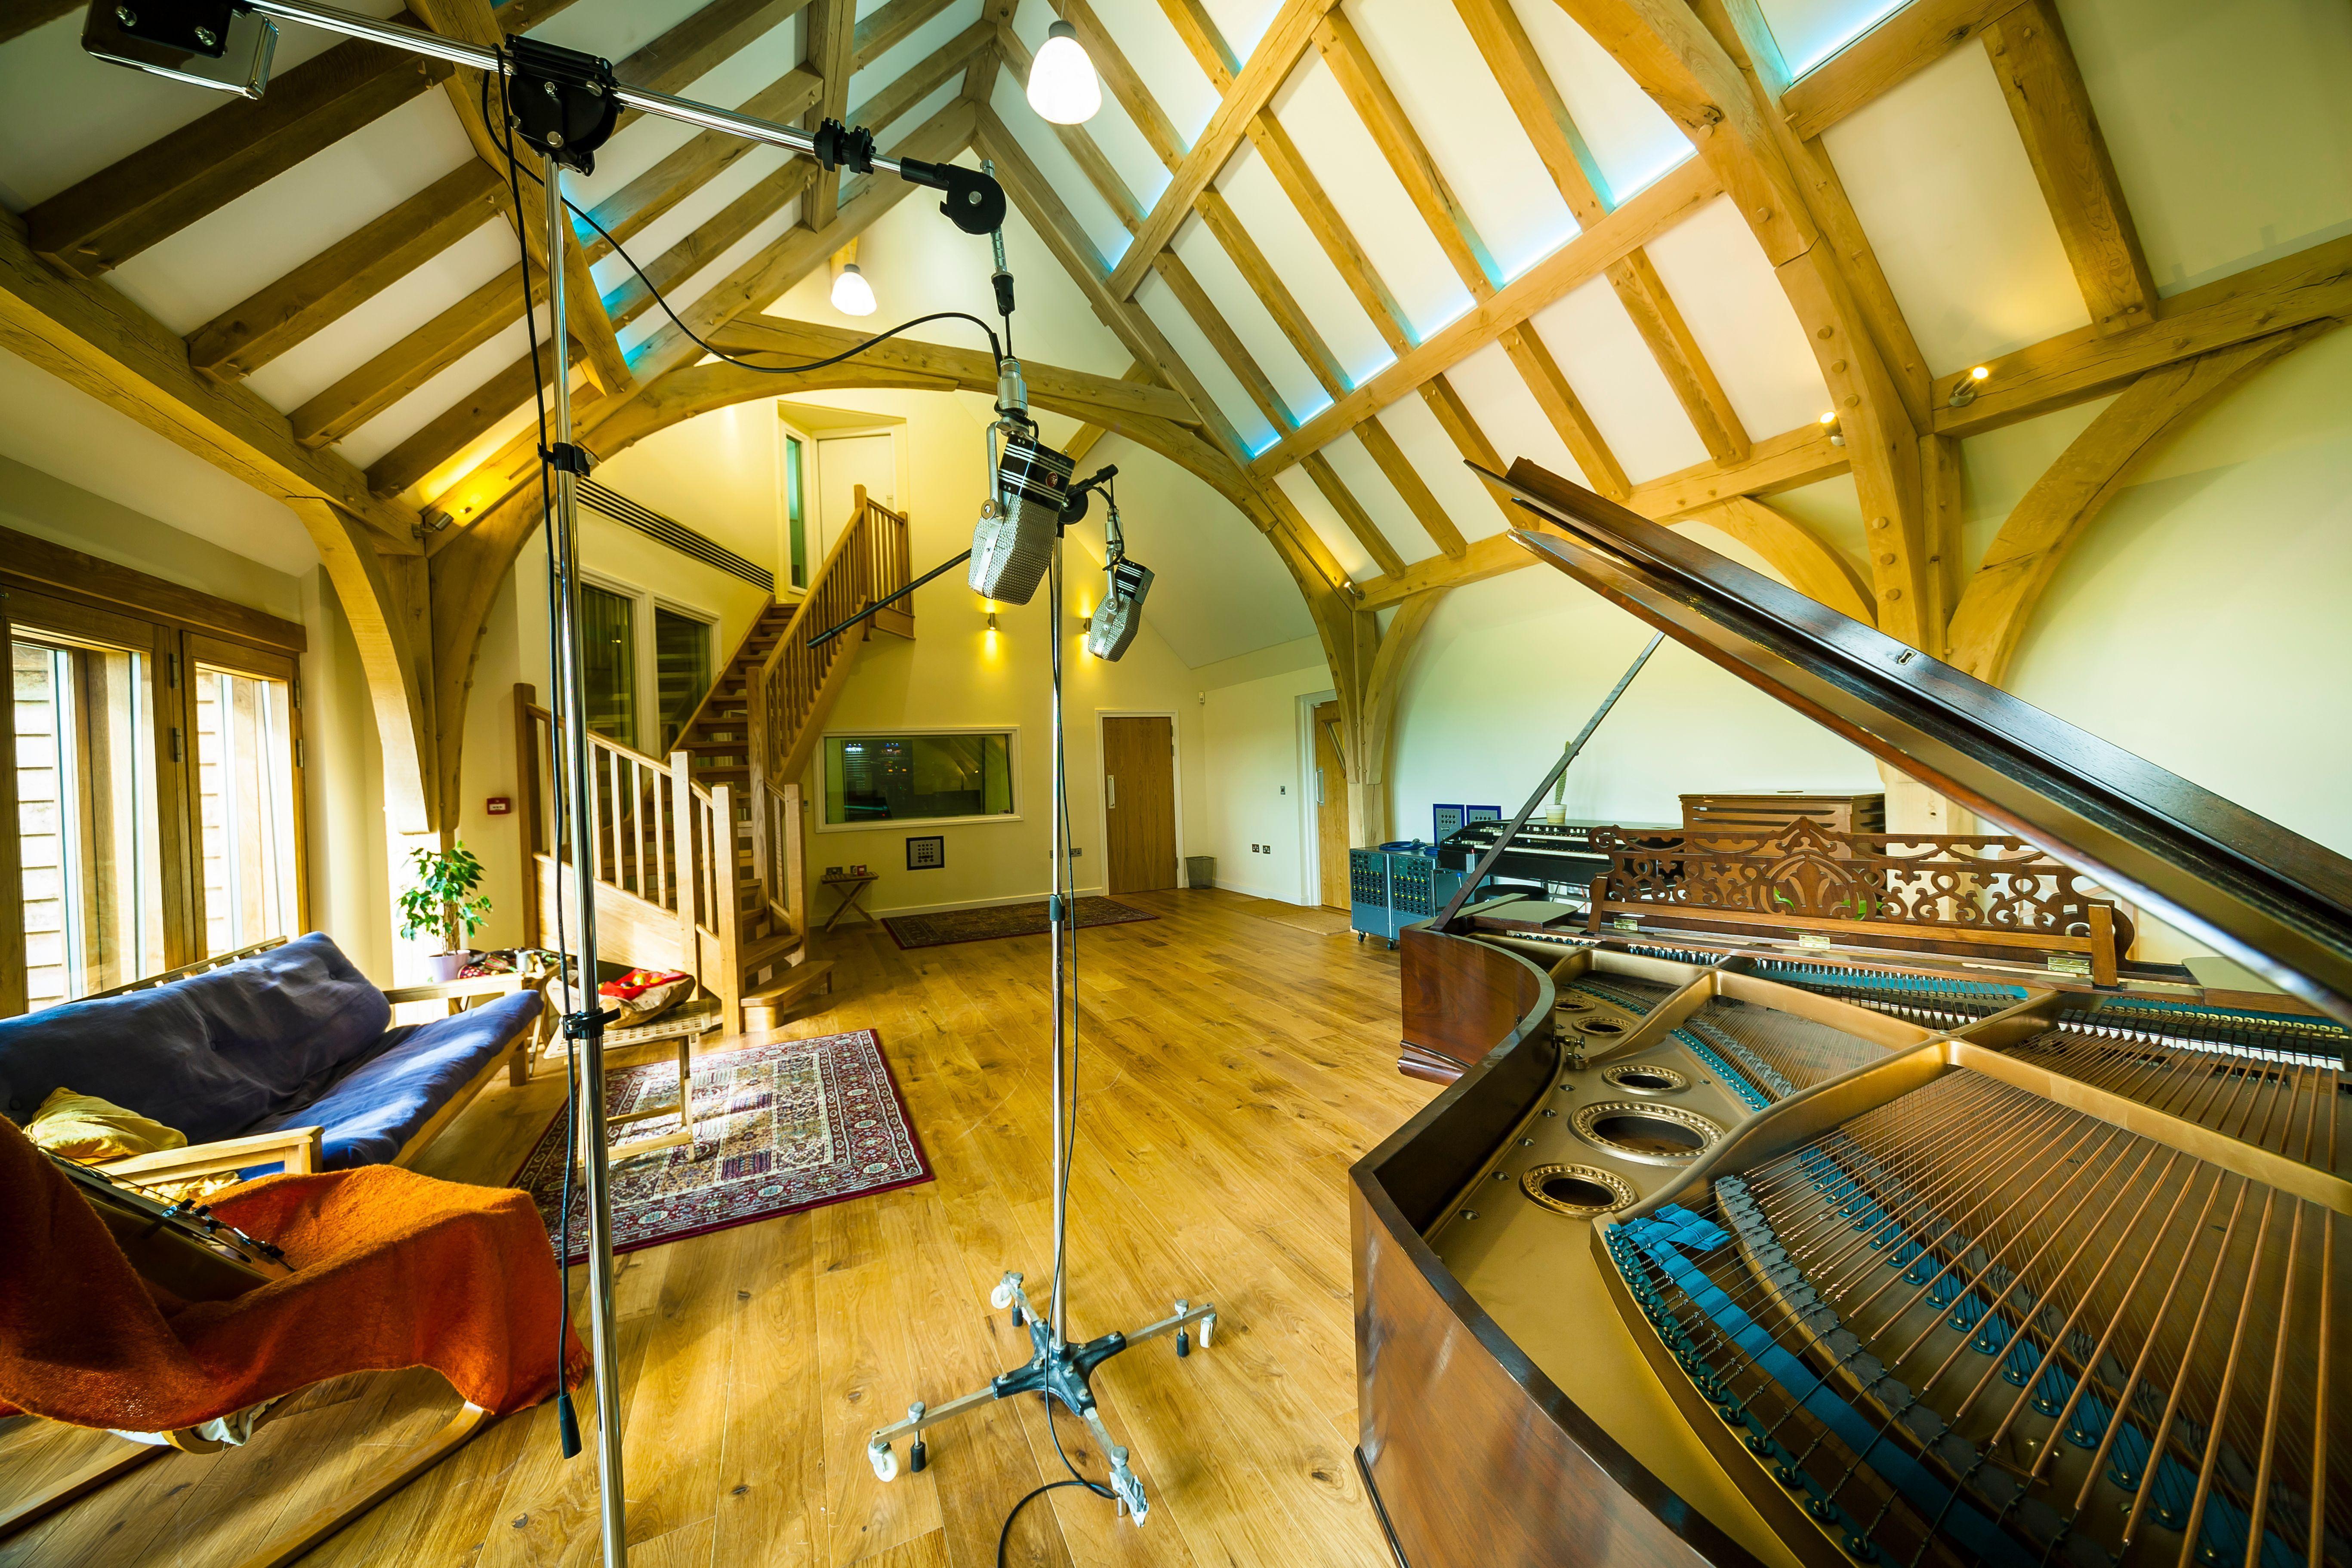 Pin by Jim Bryson on Recording Studio ideas   Recording ...